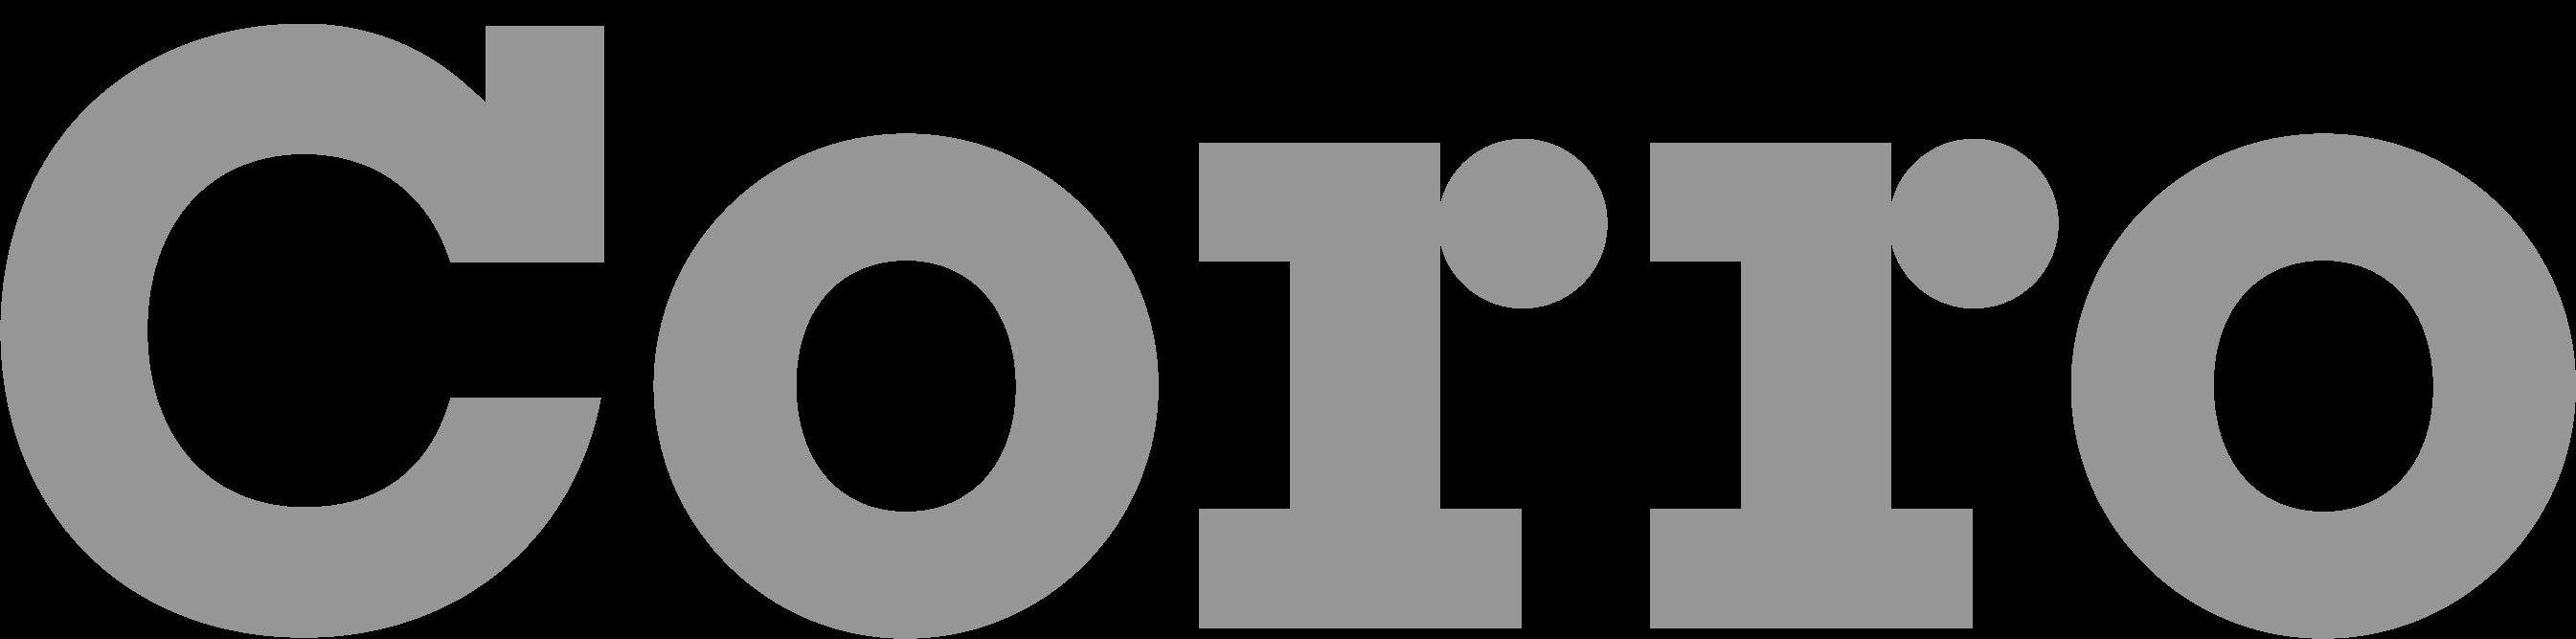 Corro logo